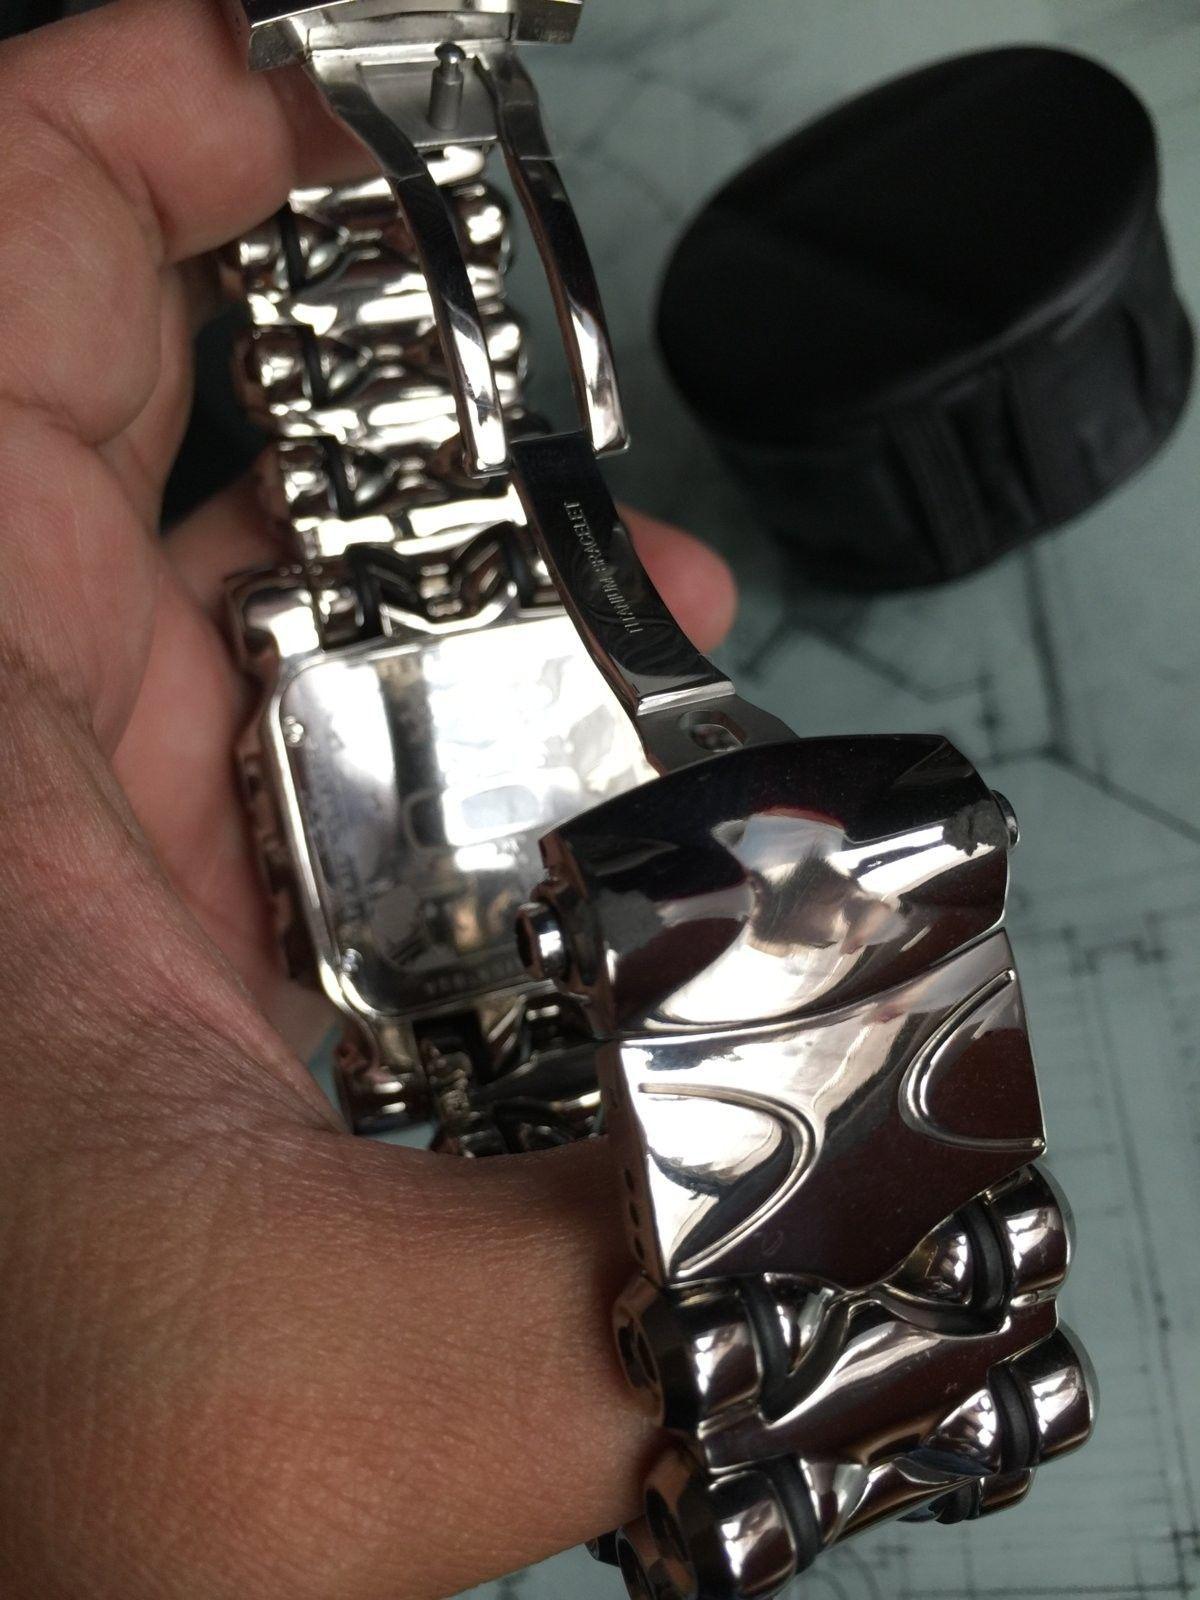 LNIB Polished Black Dial Minute Machine watch - IMG_6081.JPG